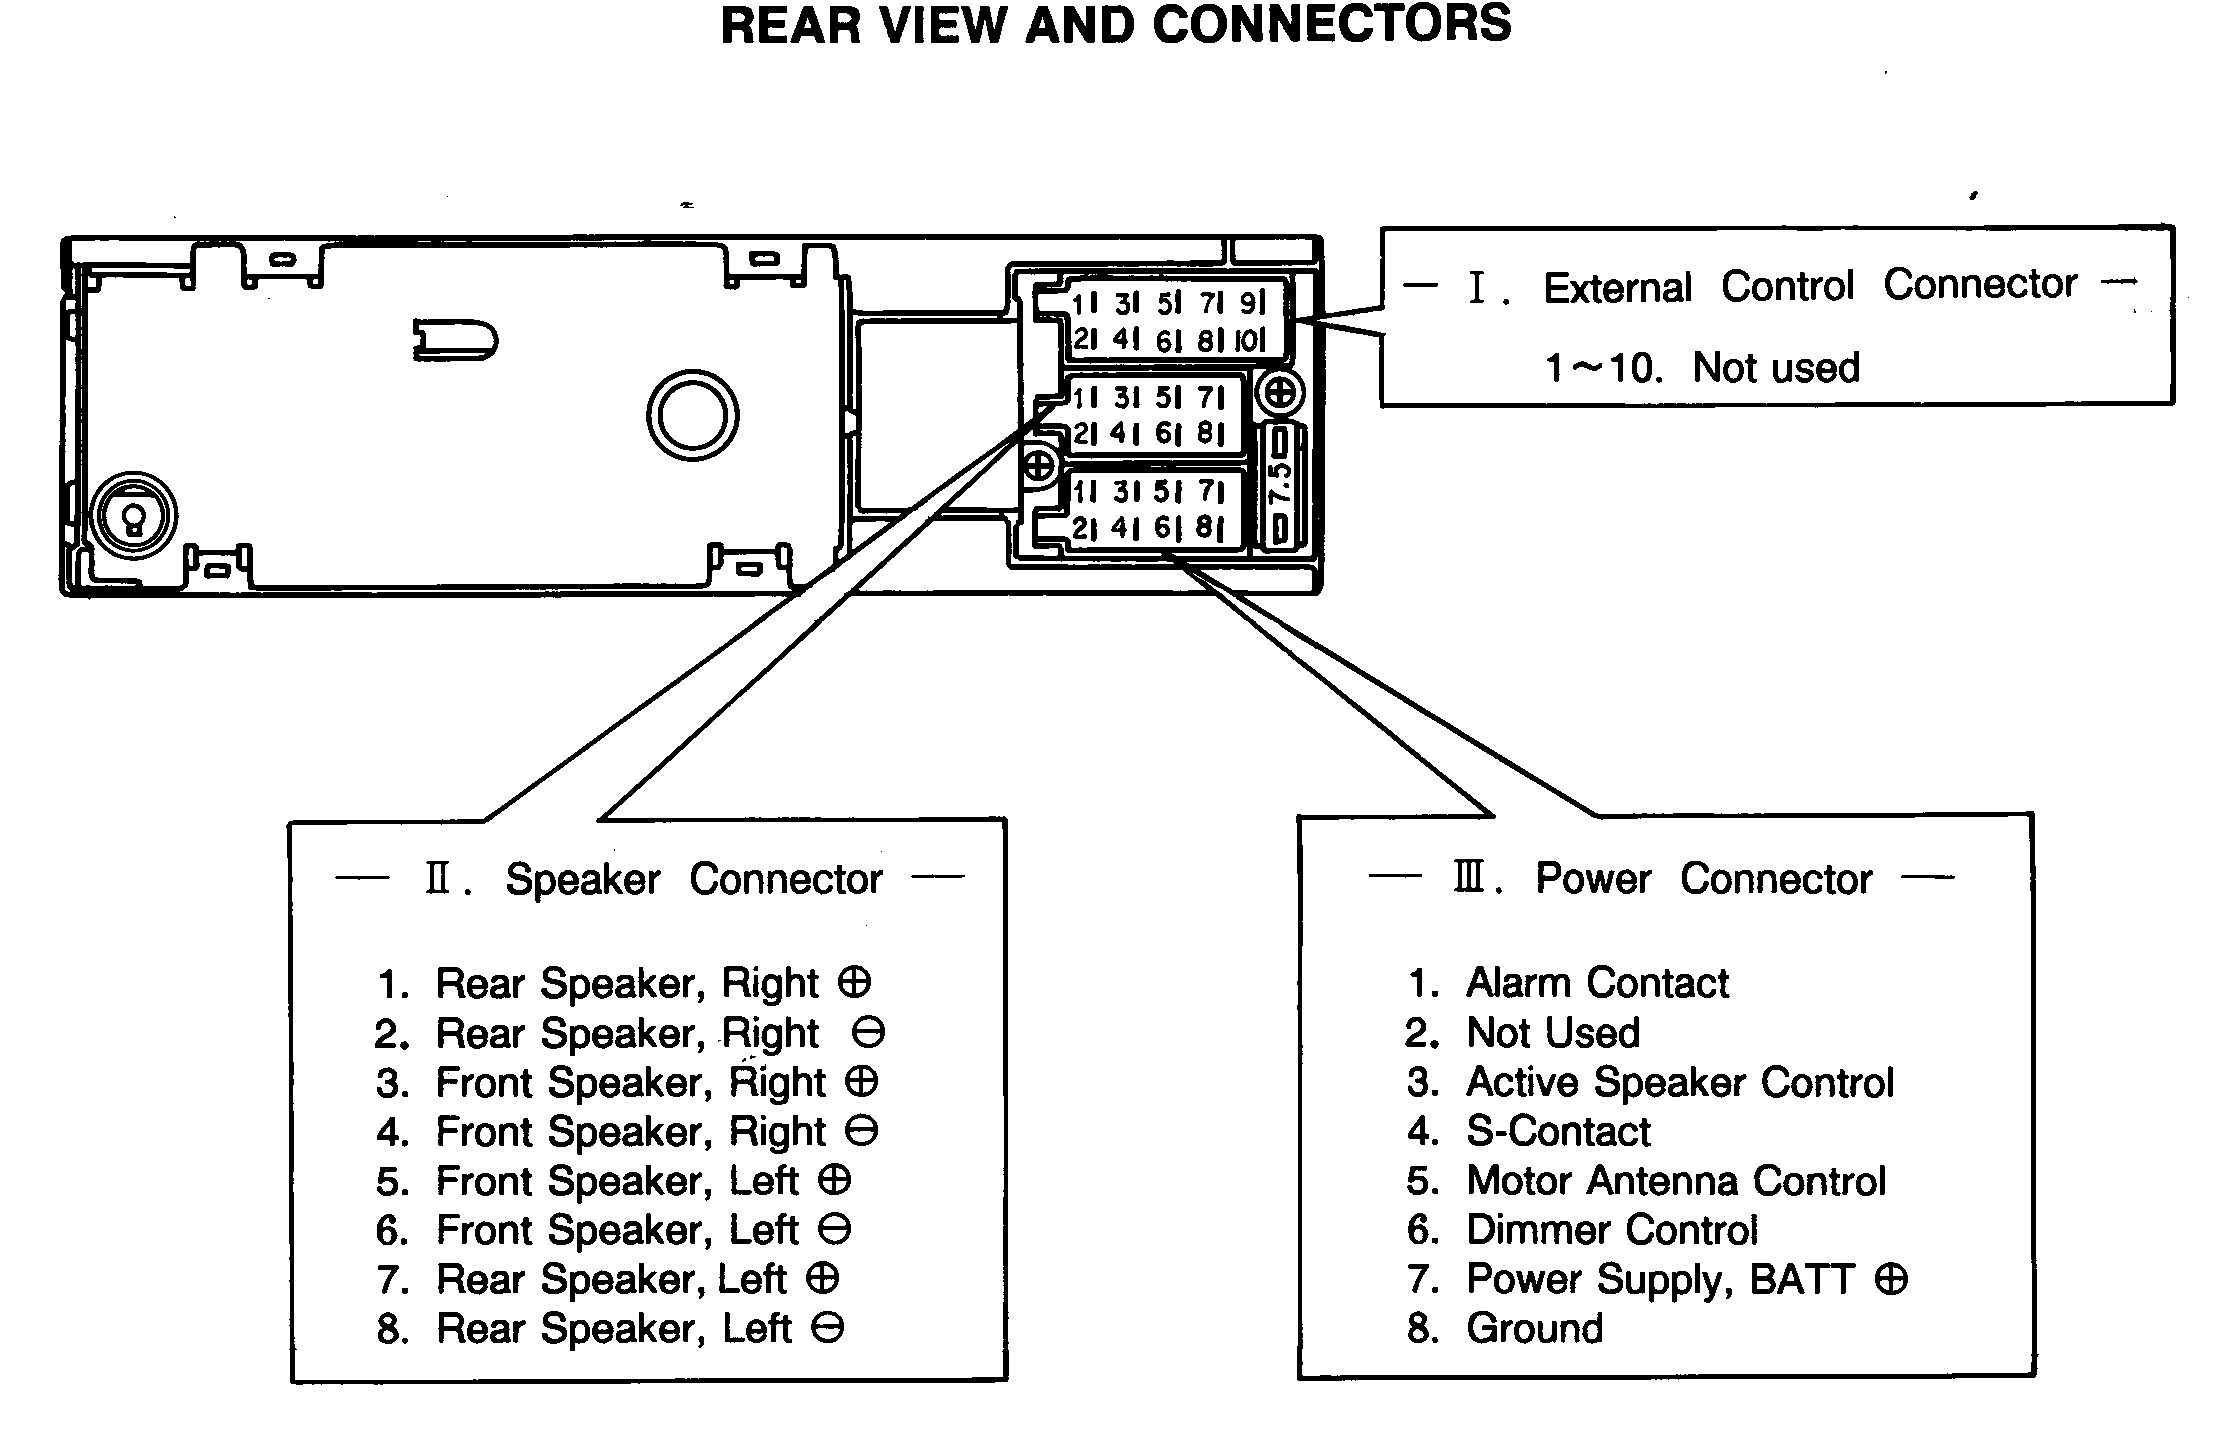 [QMVU_8575]  XK_5895] 1993 Nissan Sentra Radio Wiring Diagram Schematic Wiring | 1993 Nissan Sentra Radio Wiring Diagram |  | Awni Odga Elae Rect Omit Kargi Hone Puti Ixtu Nowa Orsal Emba  Mohammedshrine Librar Wiring 101